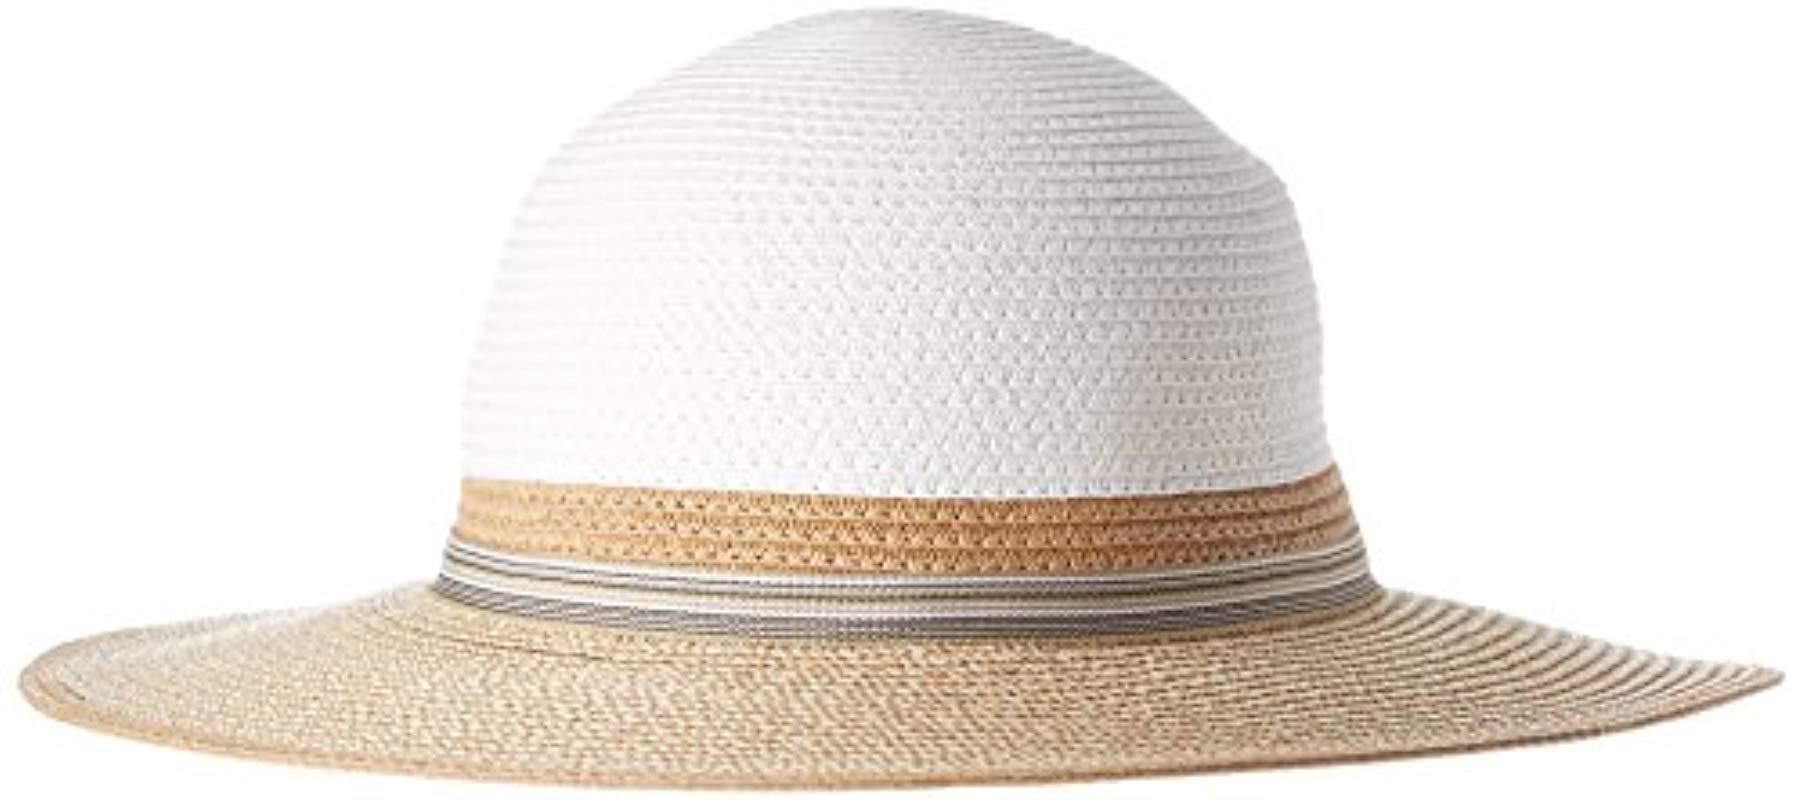 4d40768de0c Lyst columbia spring drifter straw hat in white jpg 1802x800 Columbia straw  hat